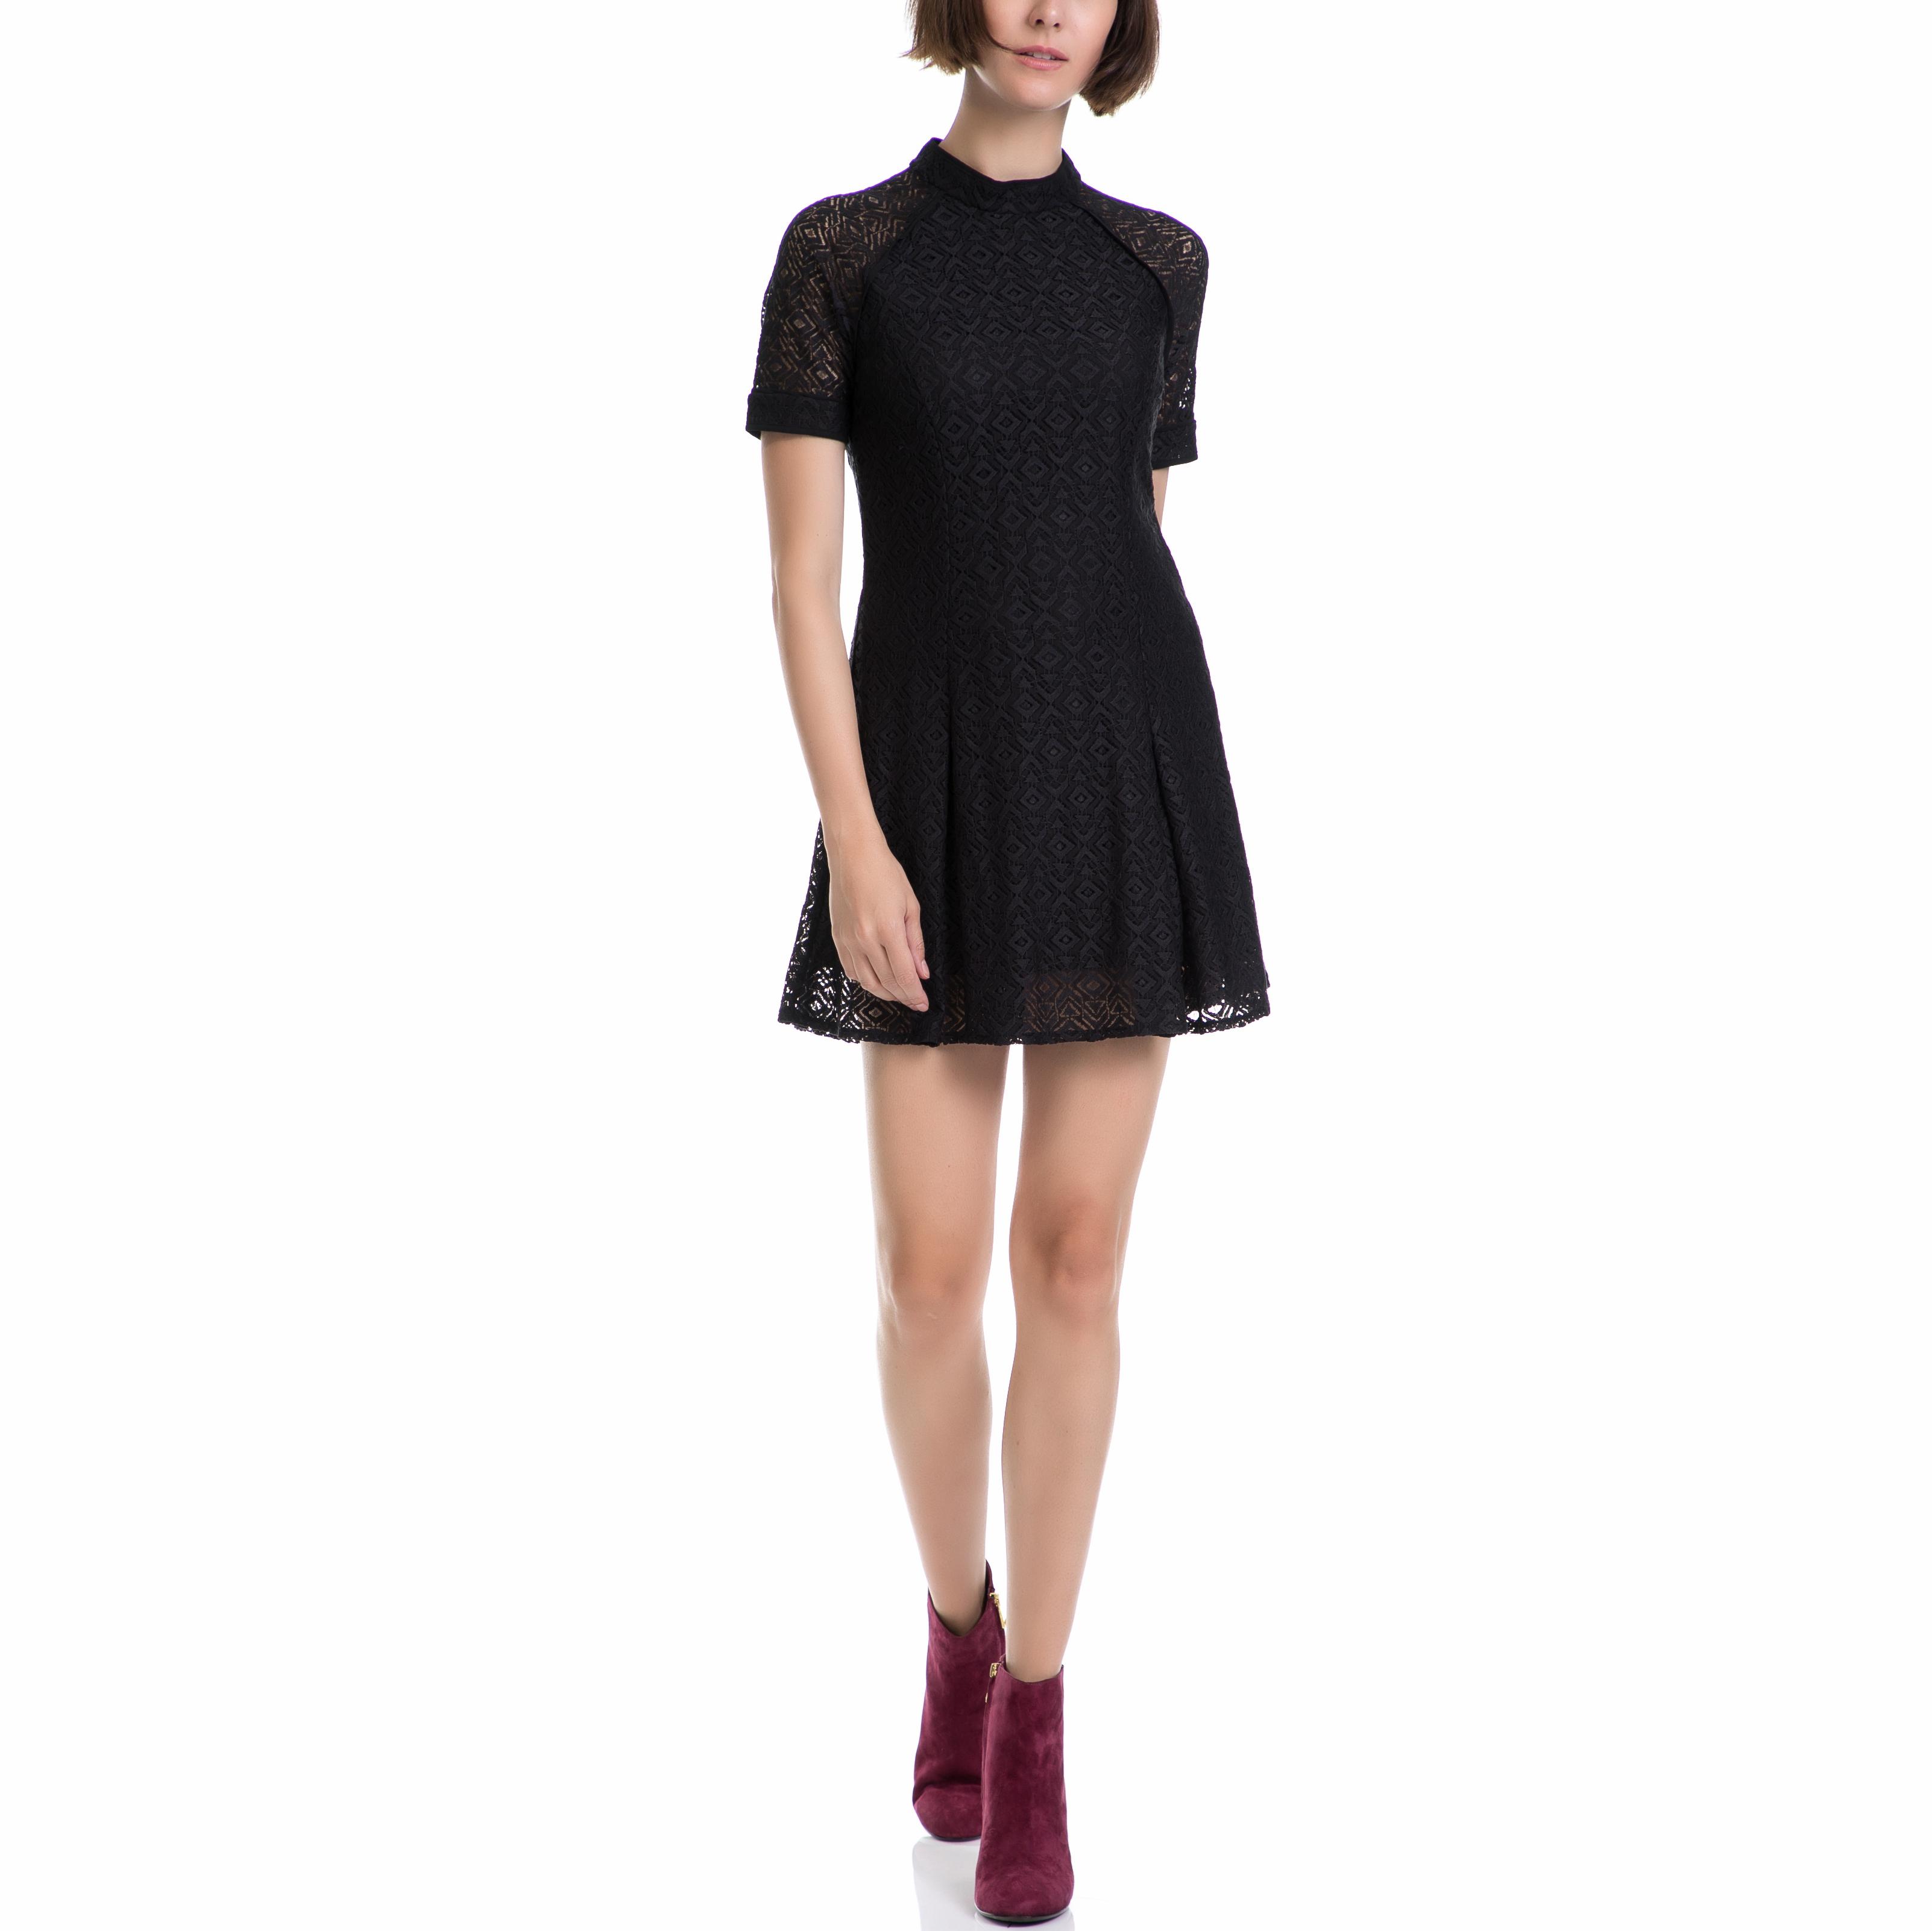 JUICY COUTURE – Γυναικείο φόρεμα JUICY COUTURE μαύρο